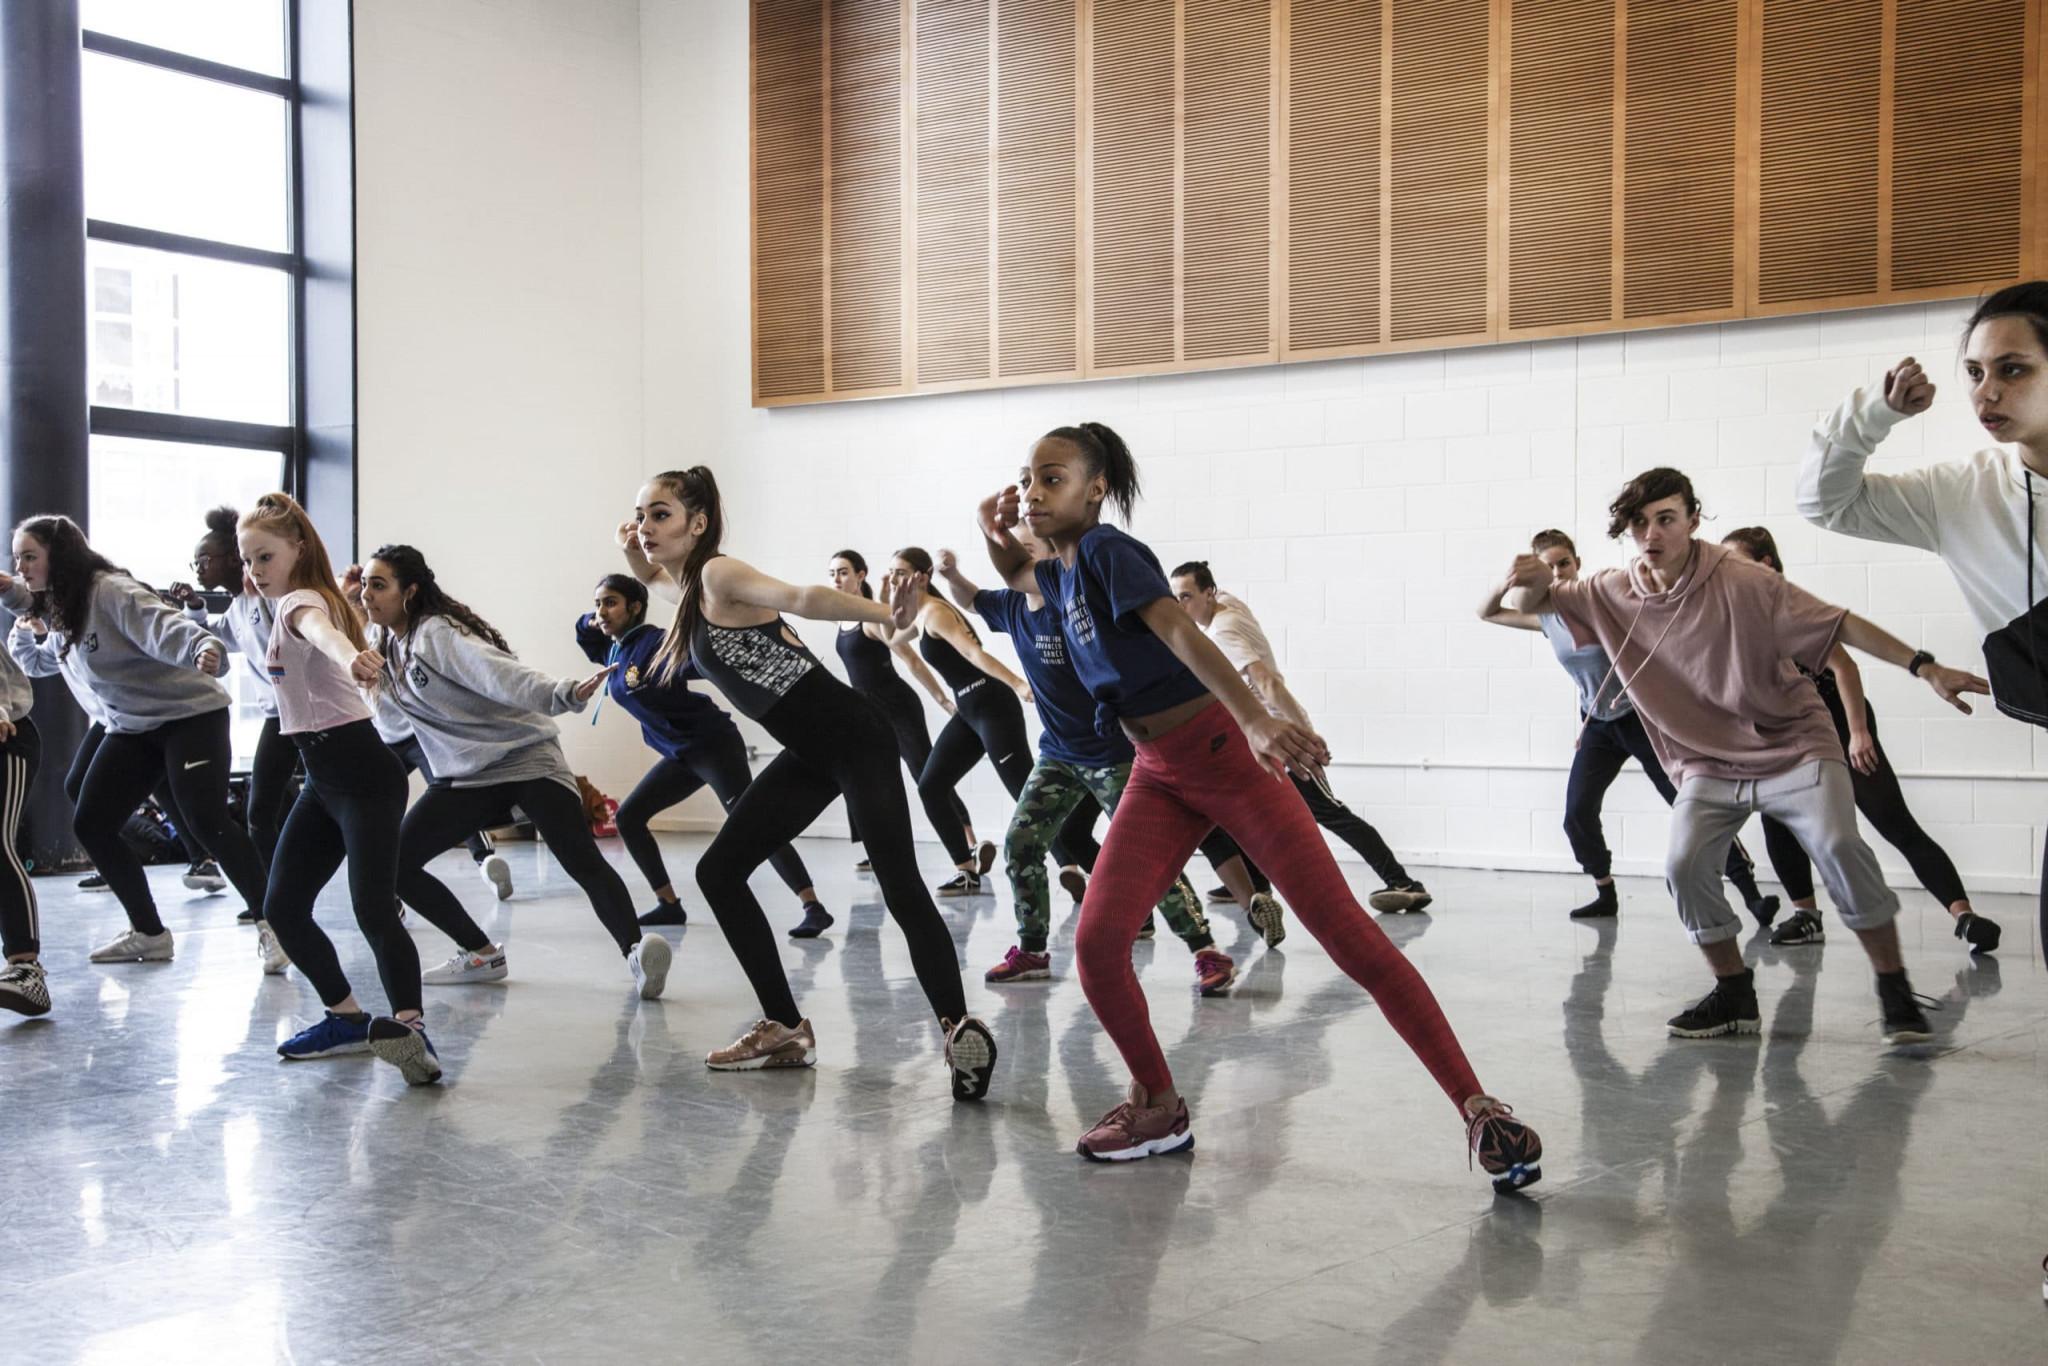 Birmingham 2022 Cultural Festival awarded funding for Ceremonies dancing